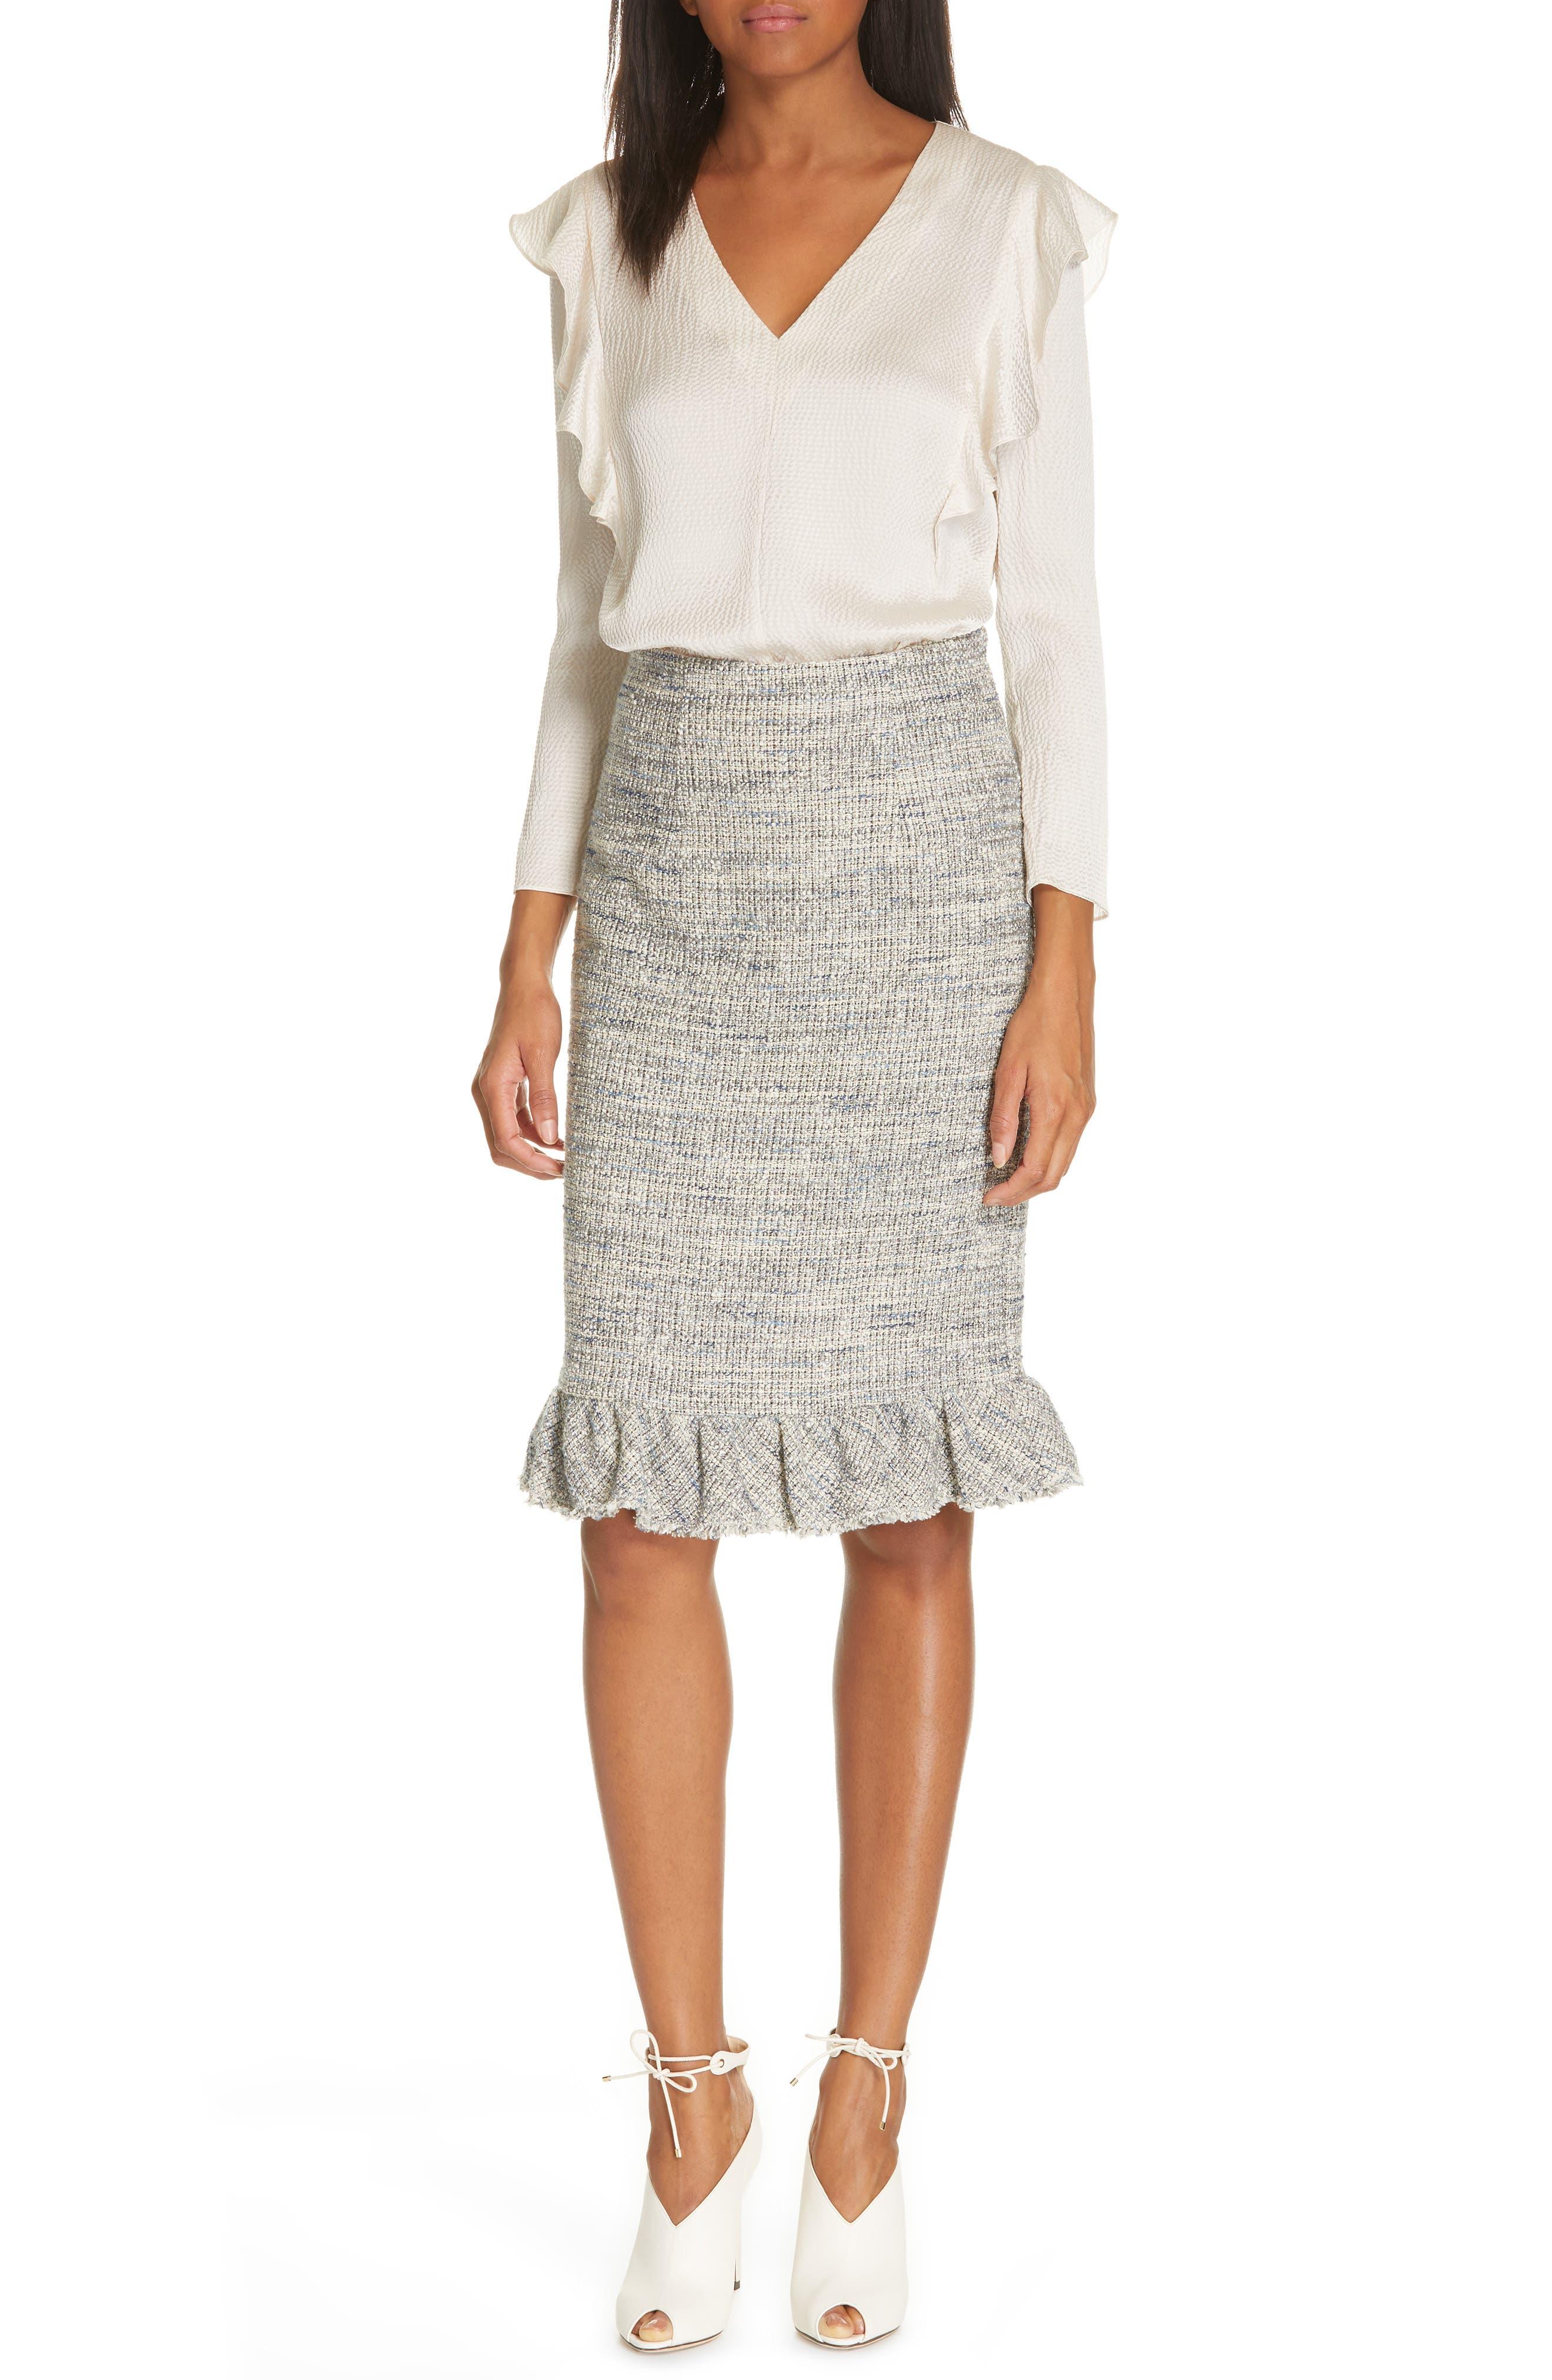 REBECCA TAYLOR, Tweed Ruffle Hem Skirt, Alternate thumbnail 7, color, 020